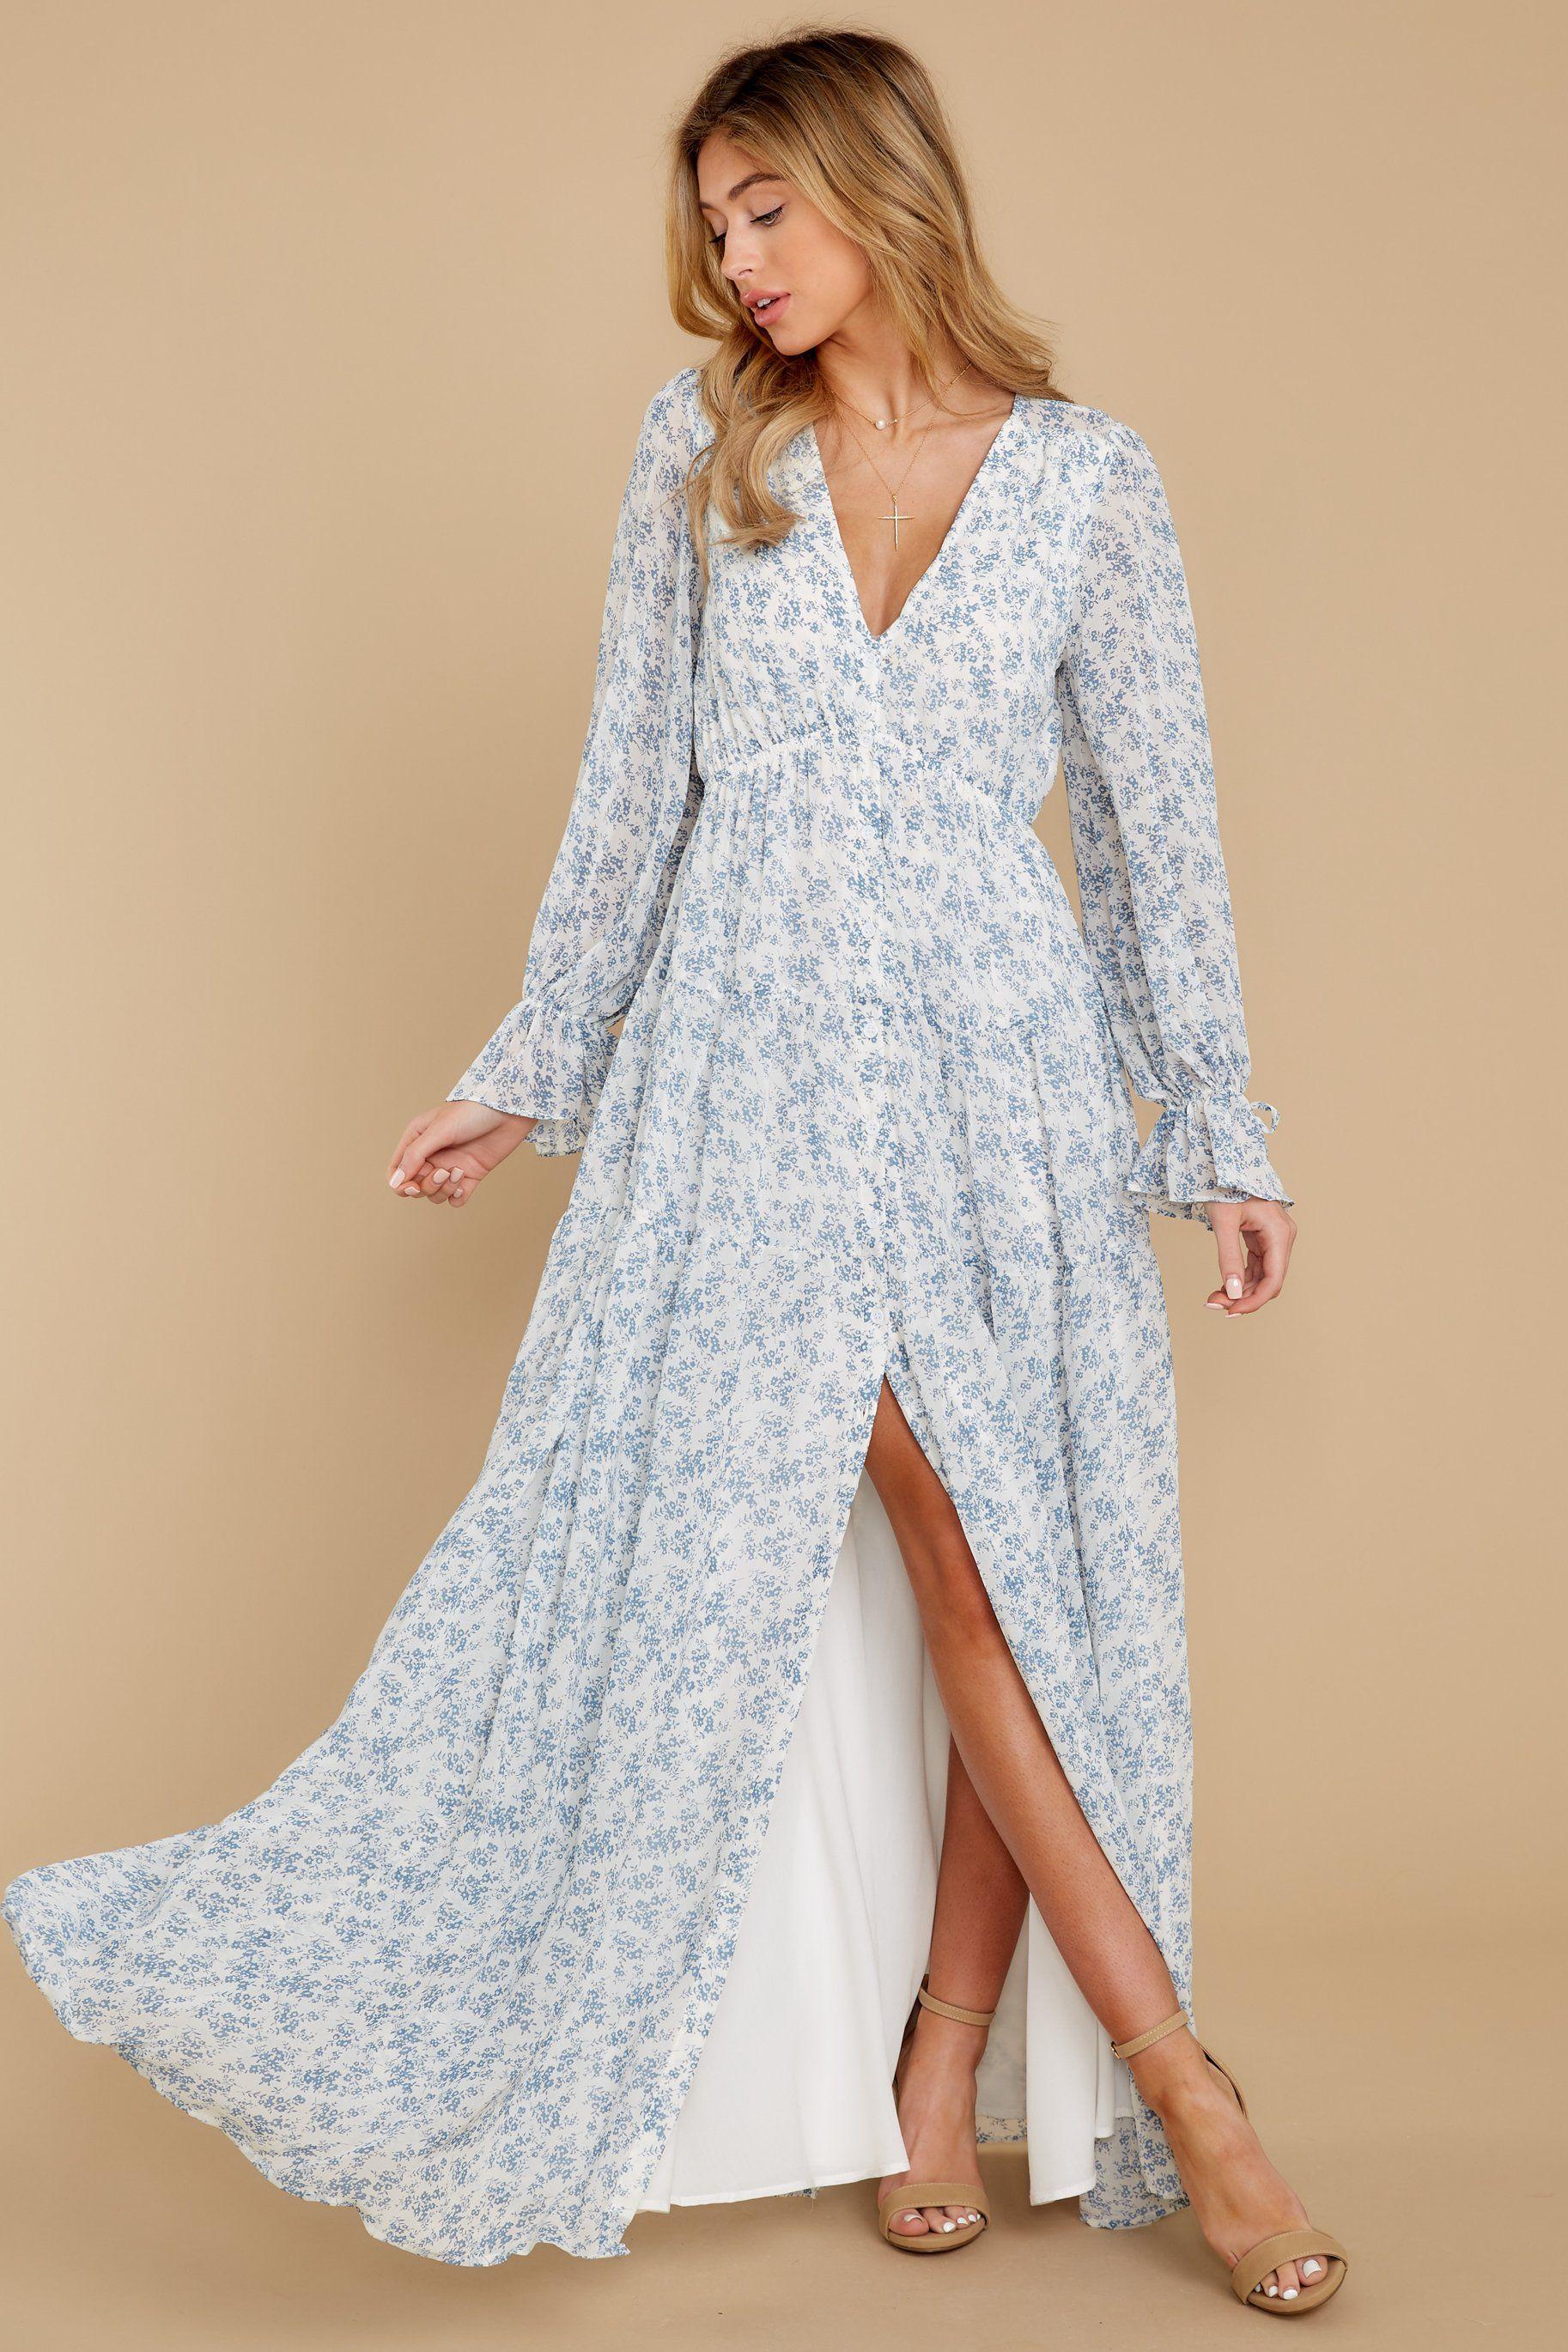 Afternoon Calm Light Blue Floral Print Maxi Dress Backorder June Maxi Dress Printed Maxi Dress Long Sleeve Maxi Dress [ 2739 x 1826 Pixel ]